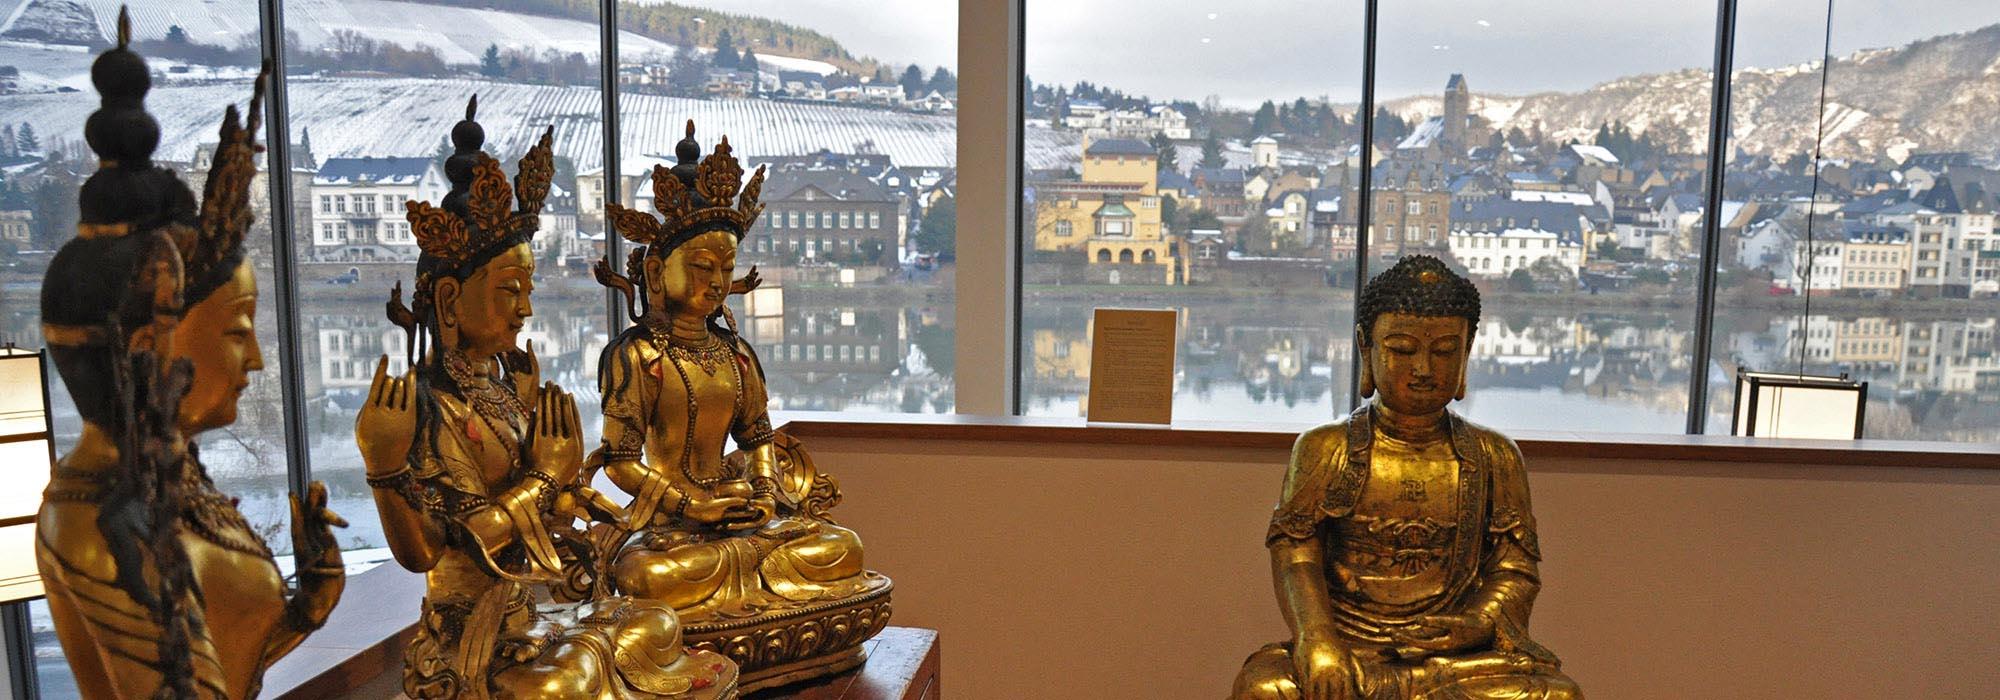 buddha-DSC_1123